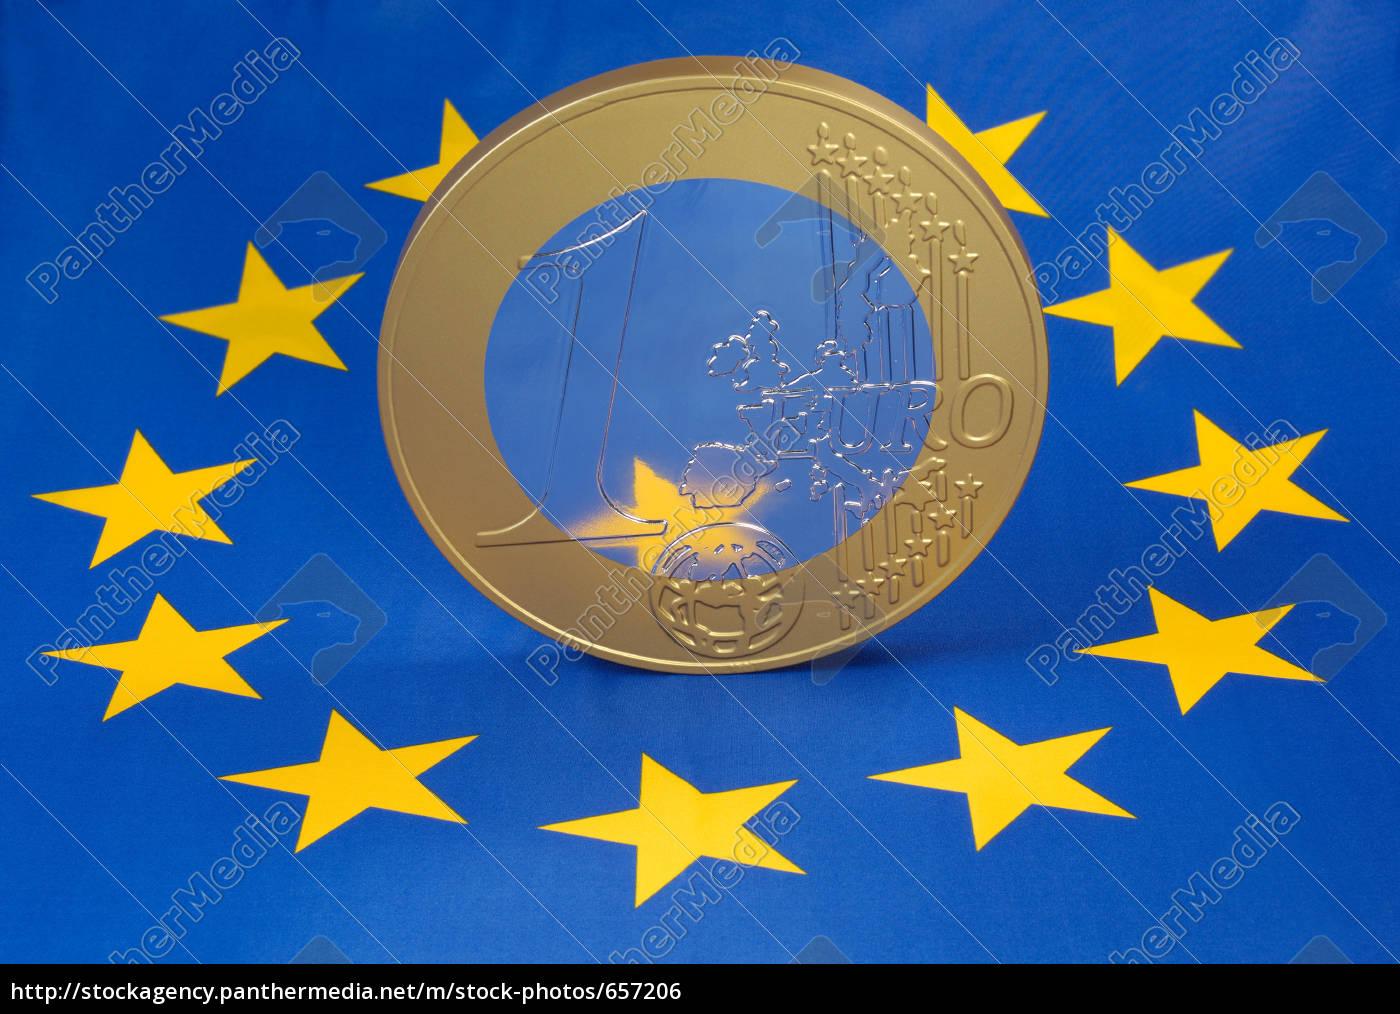 euro, coin, on, the, european, flag - 657206